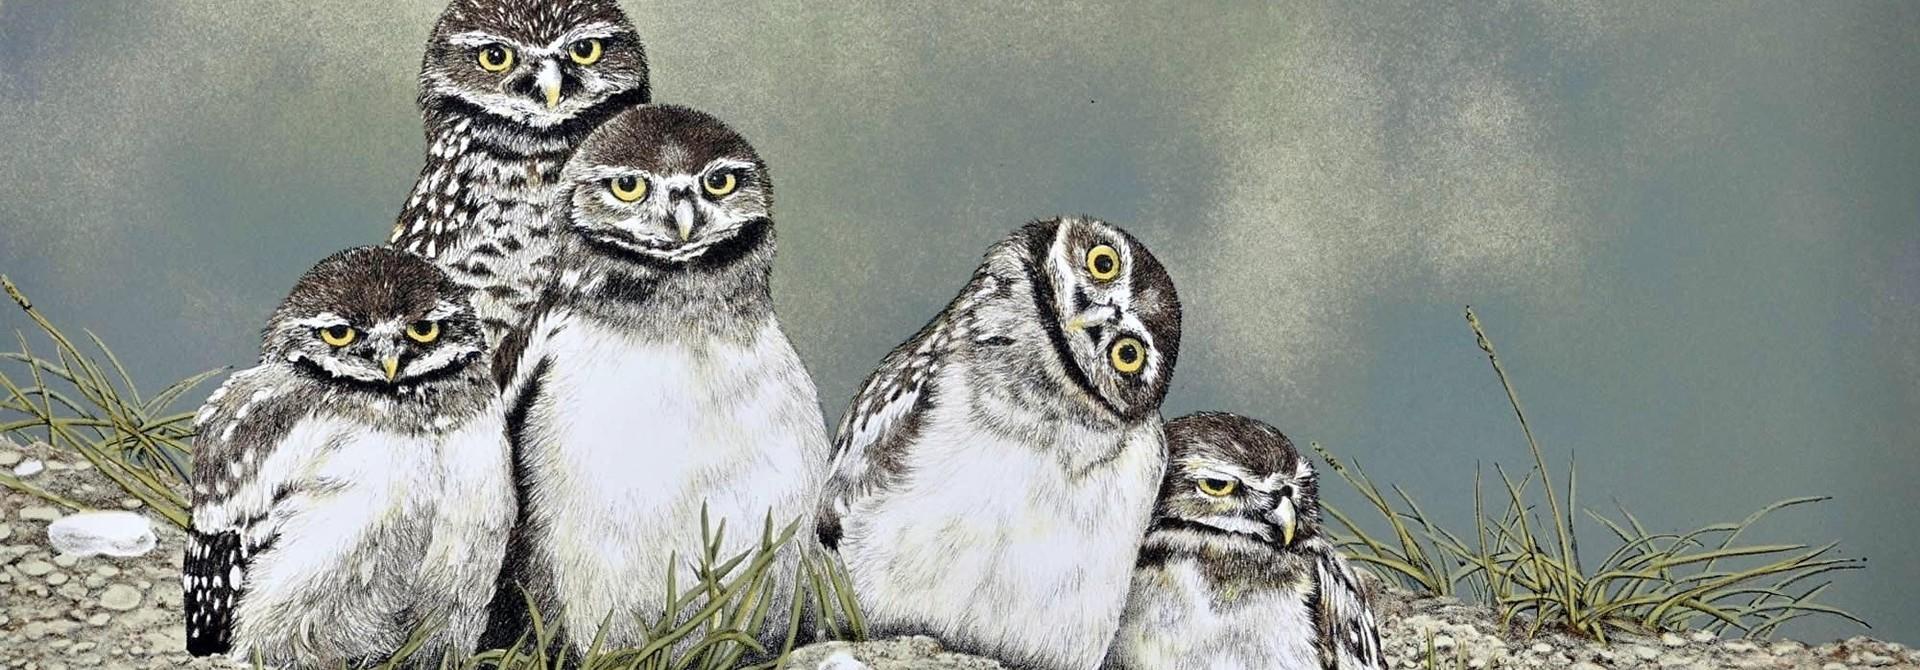 Burrowing Owls (framed)